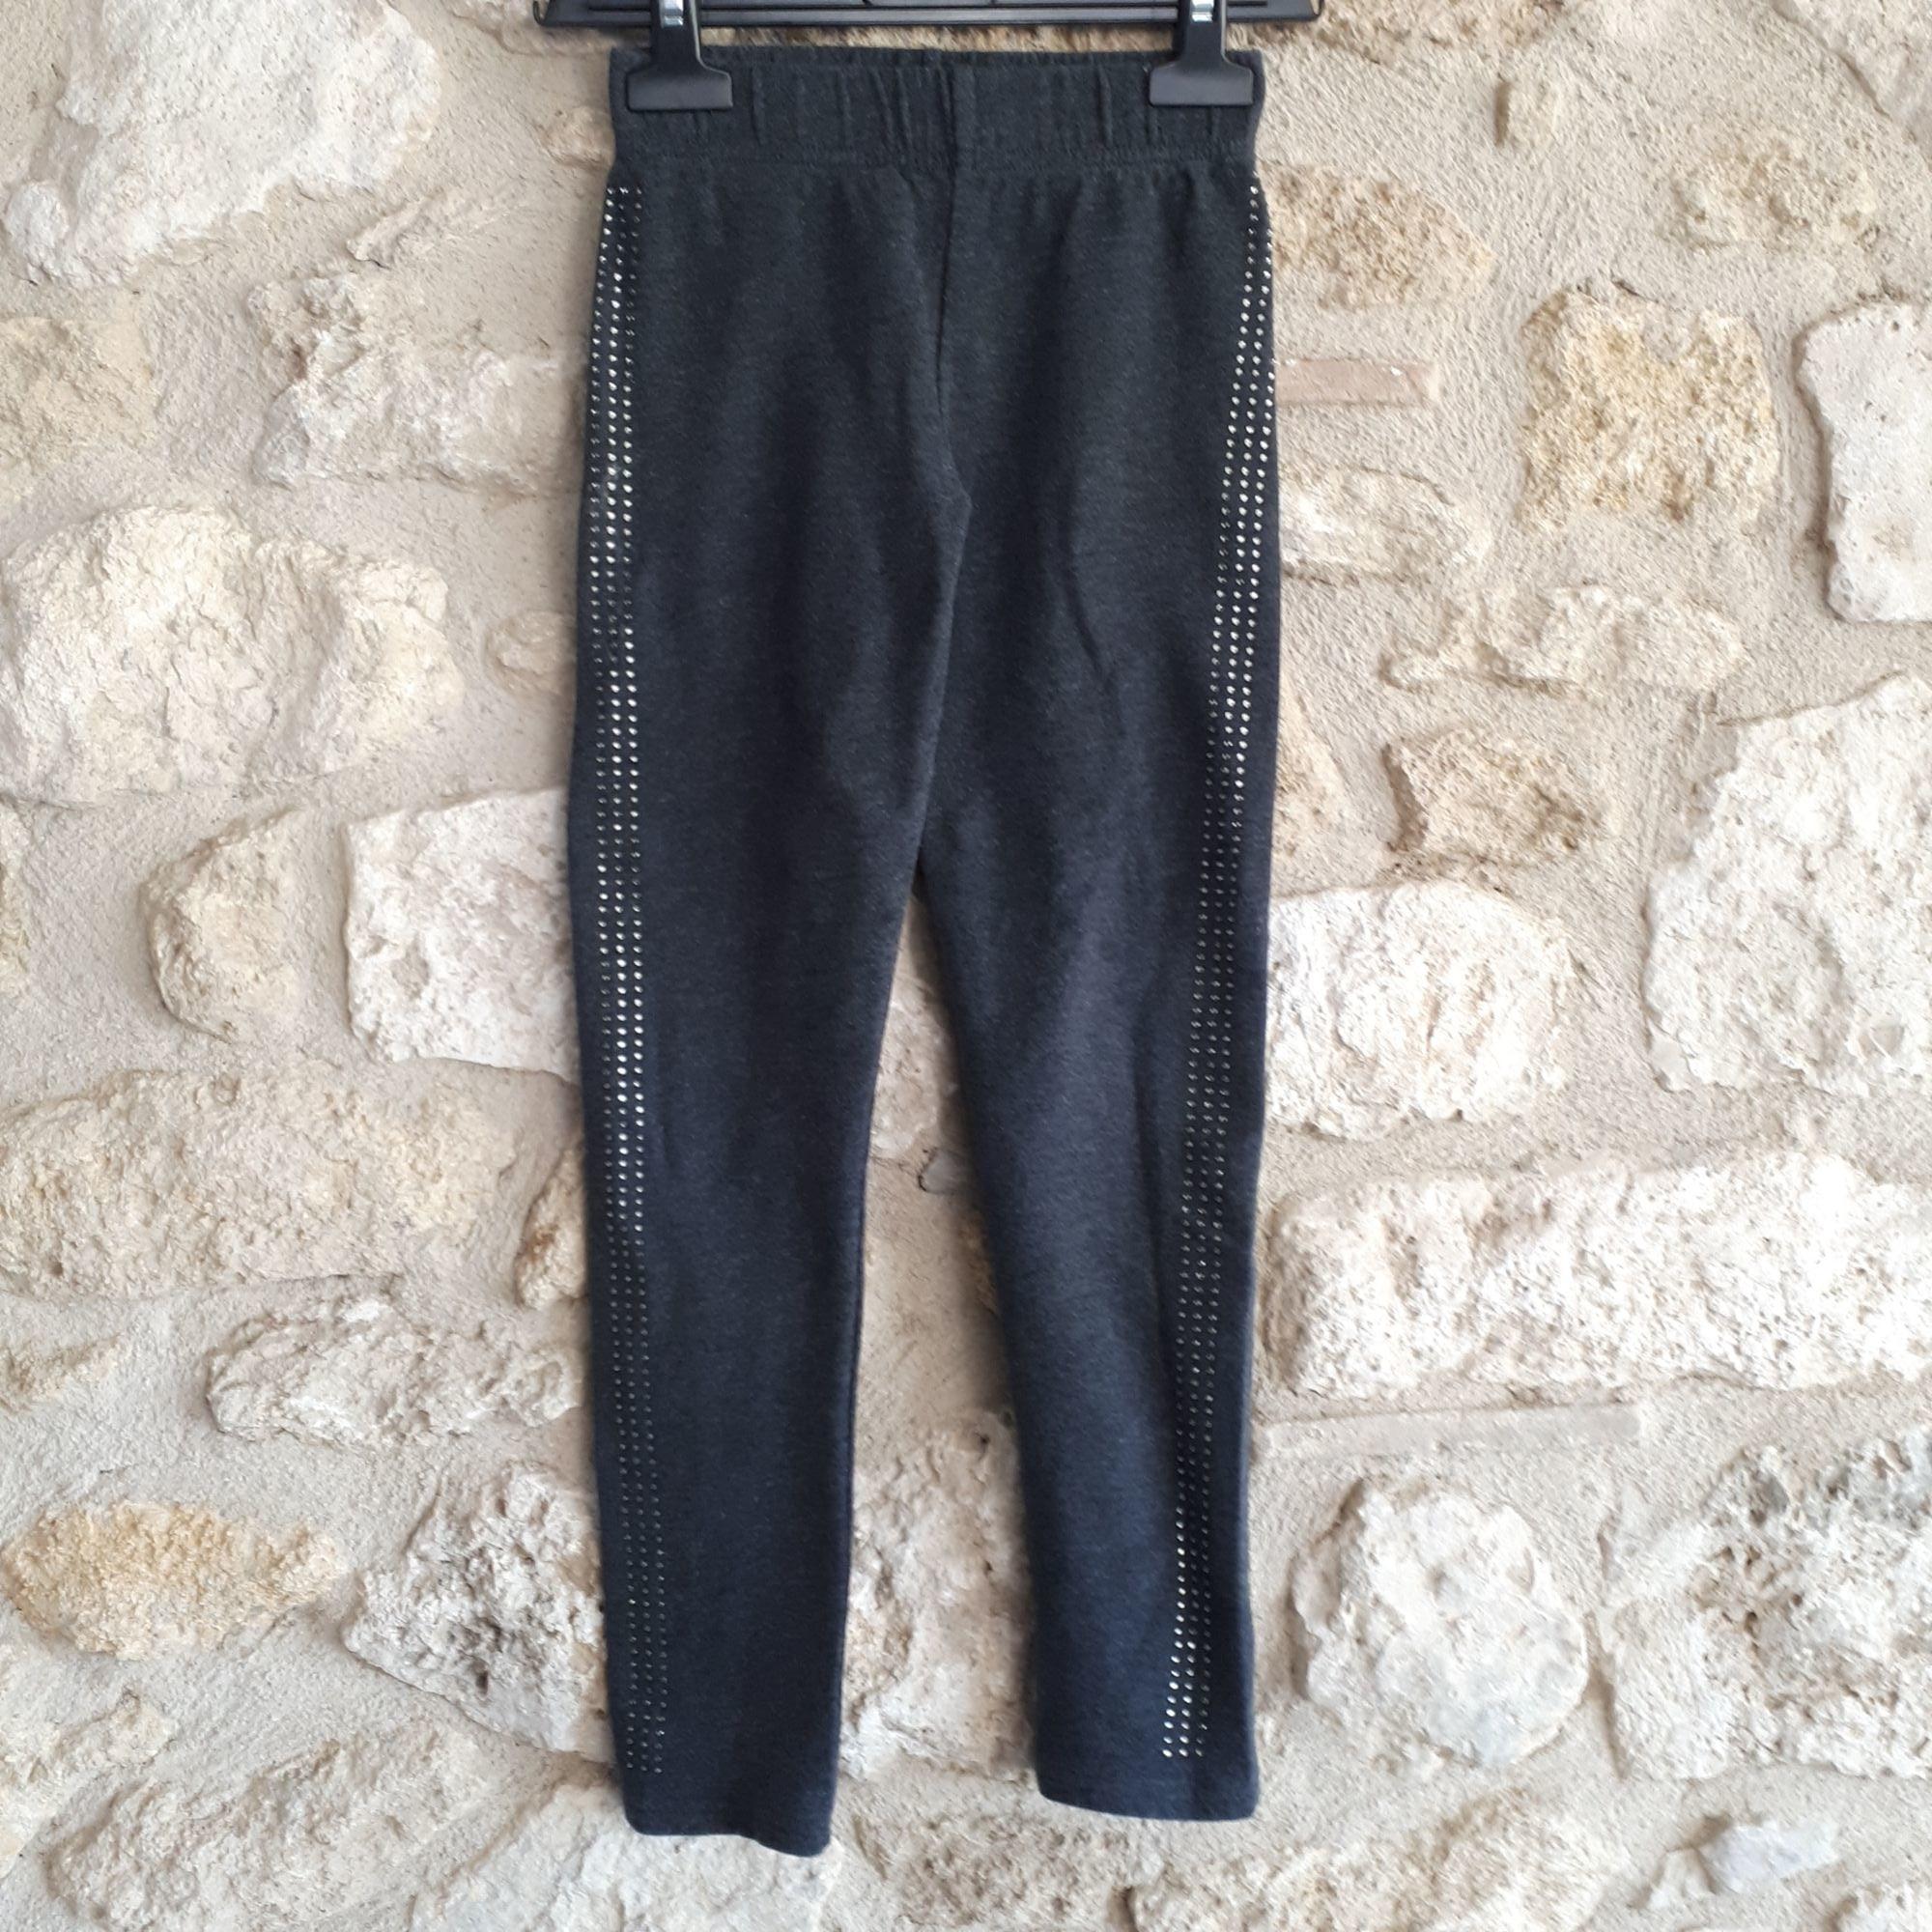 Pantalon CALZEDONIA Gris, anthracite